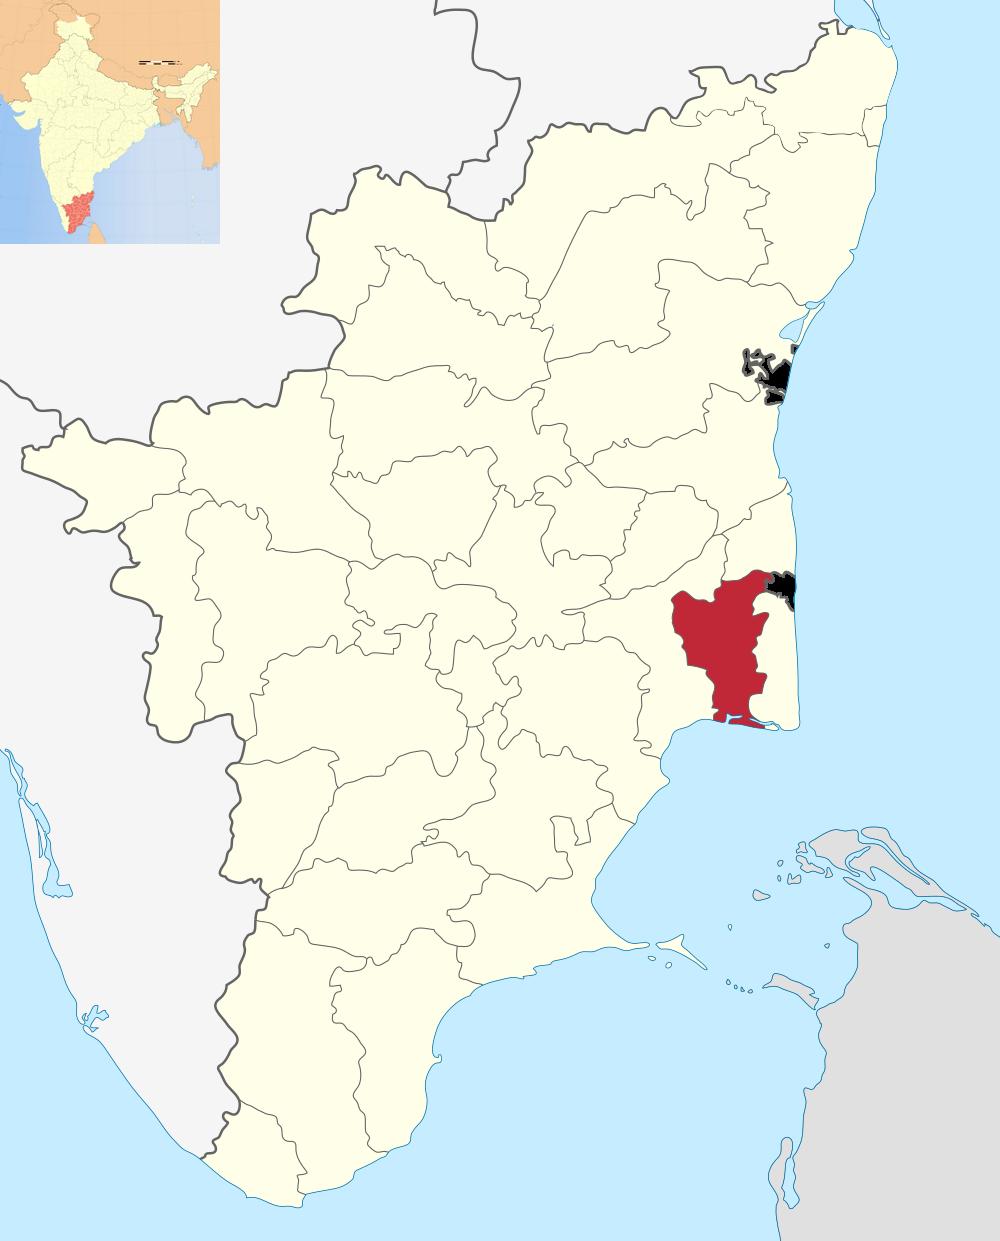 Thiruvarur in the past, History of Thiruvarur